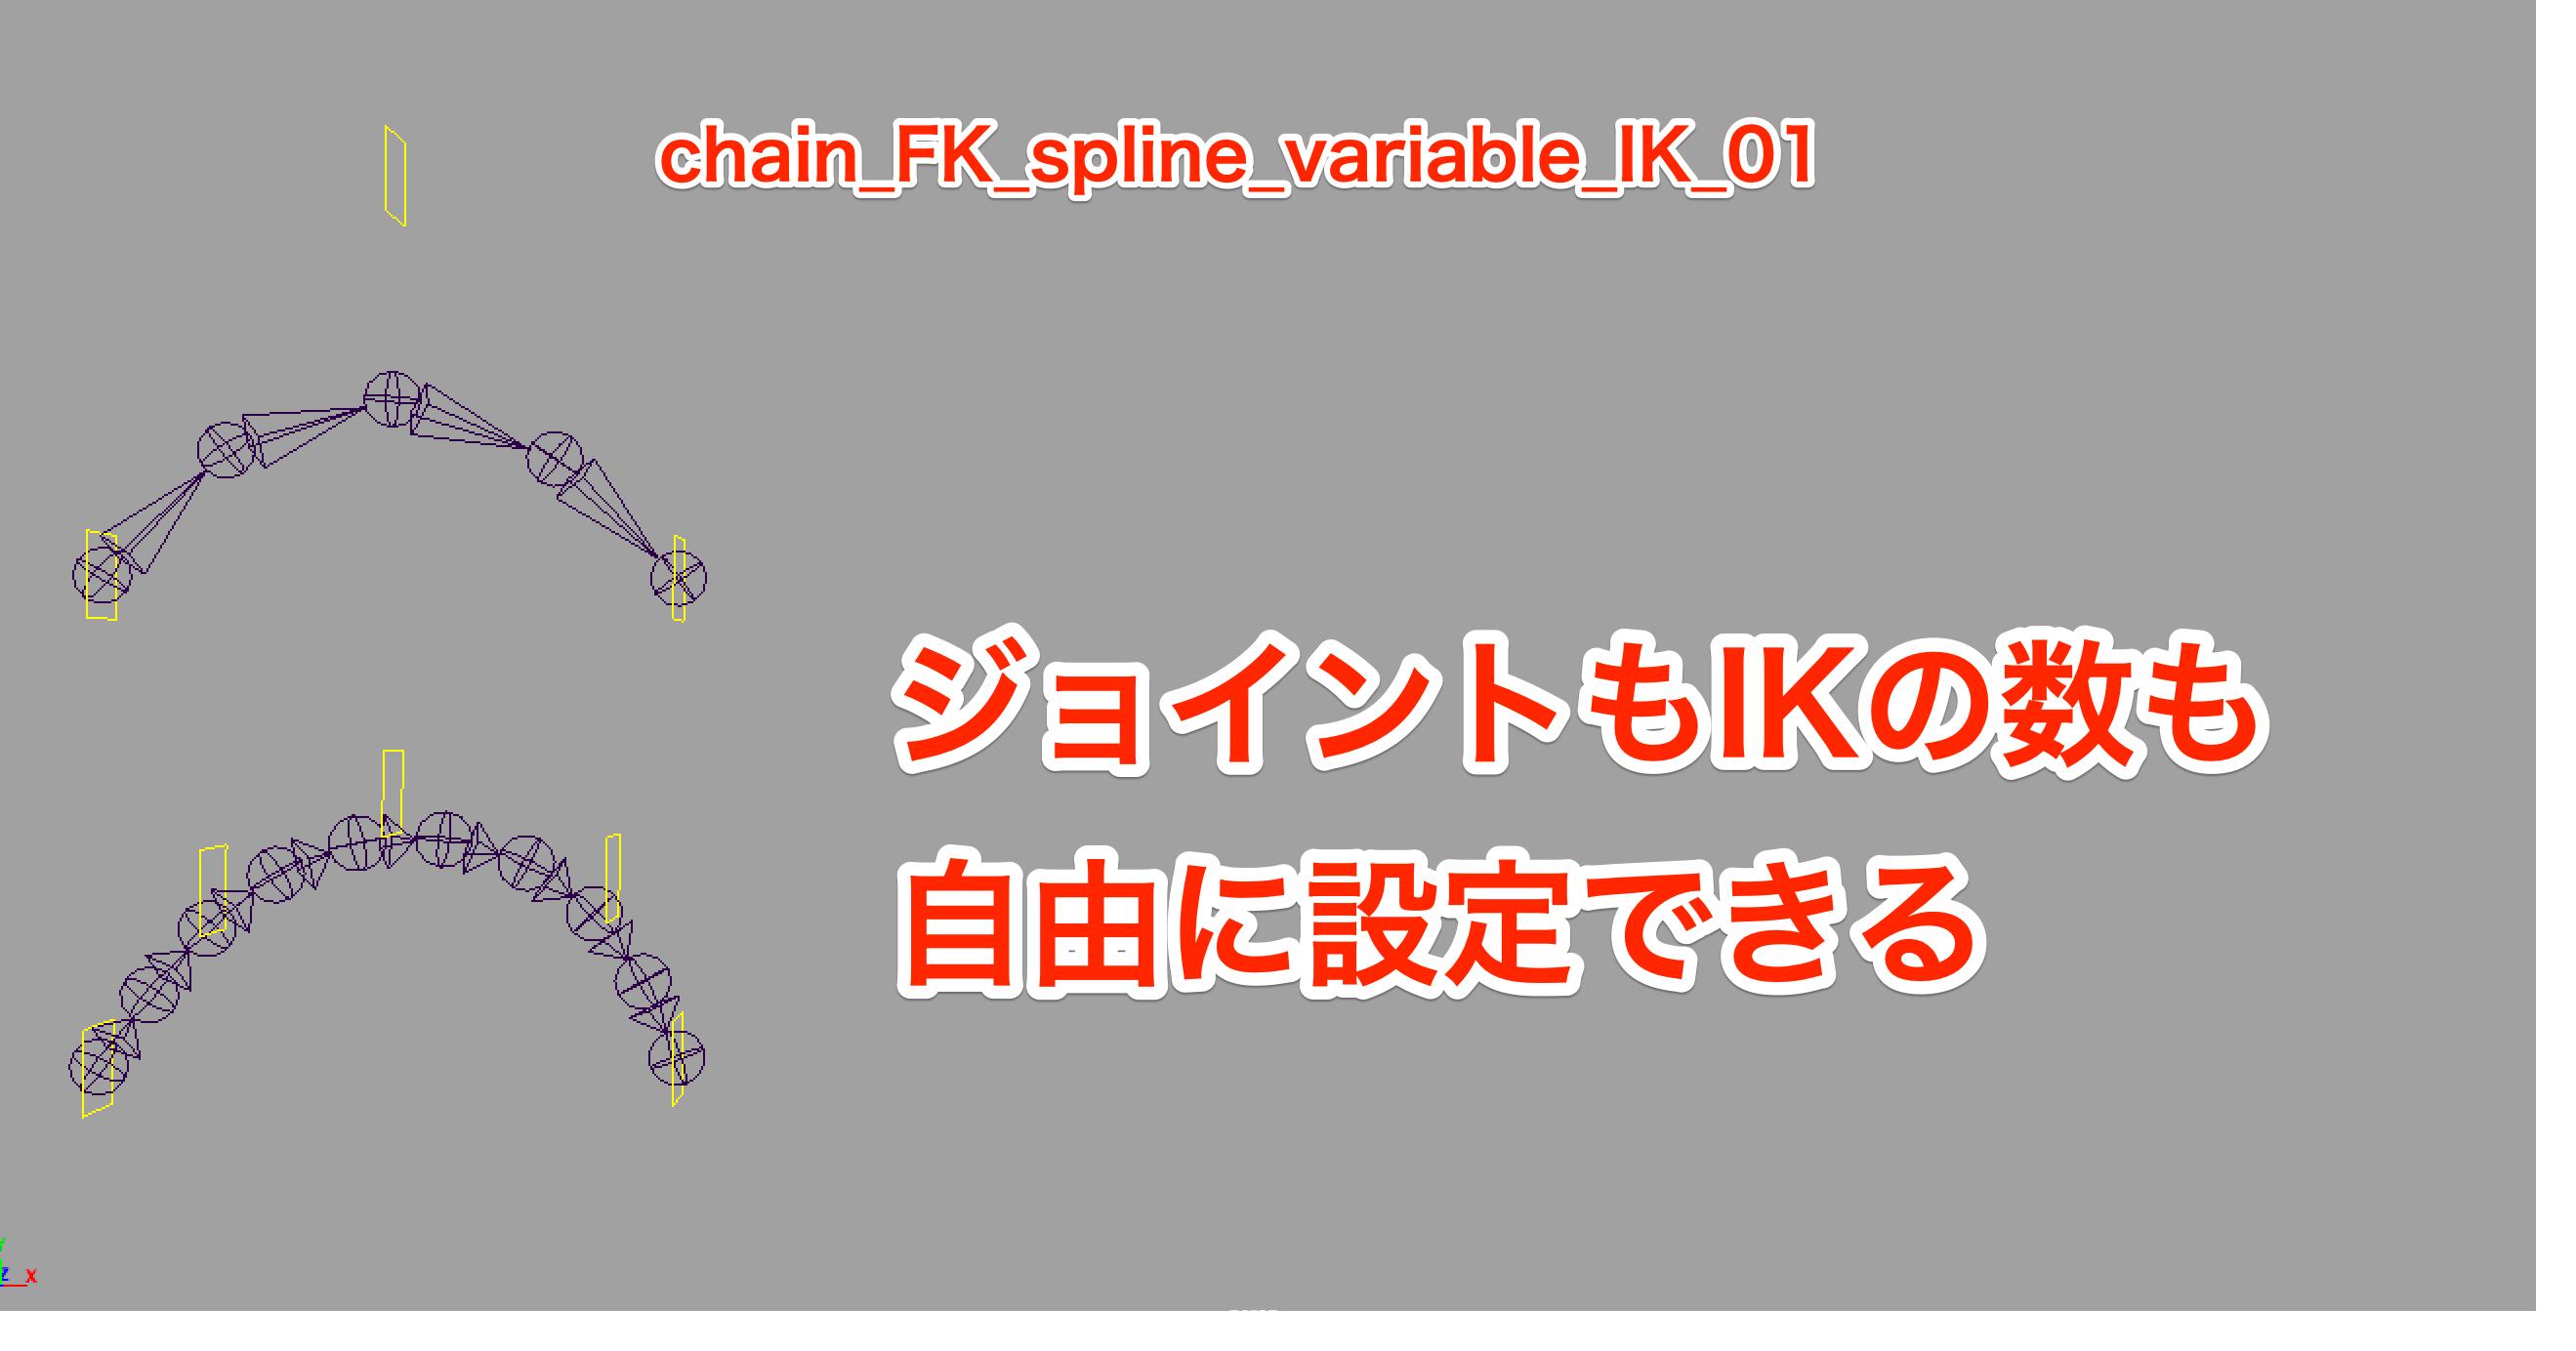 chain_FK_spline_variable_IK_01-002.png